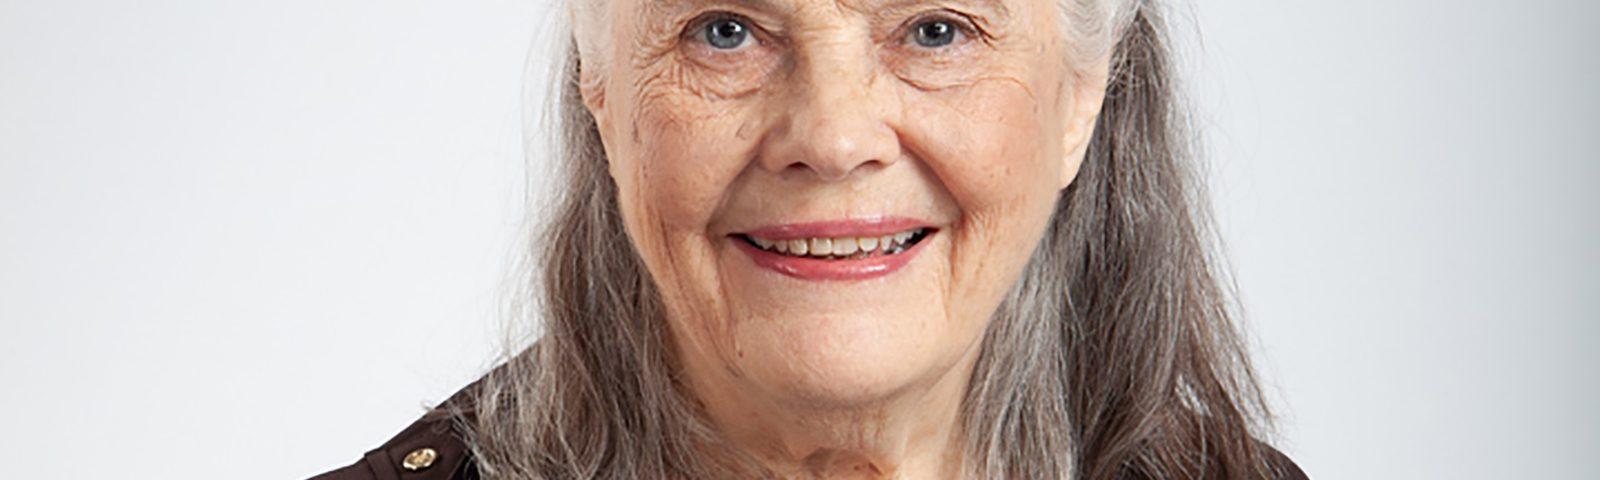 Lois Smith age 1600x480